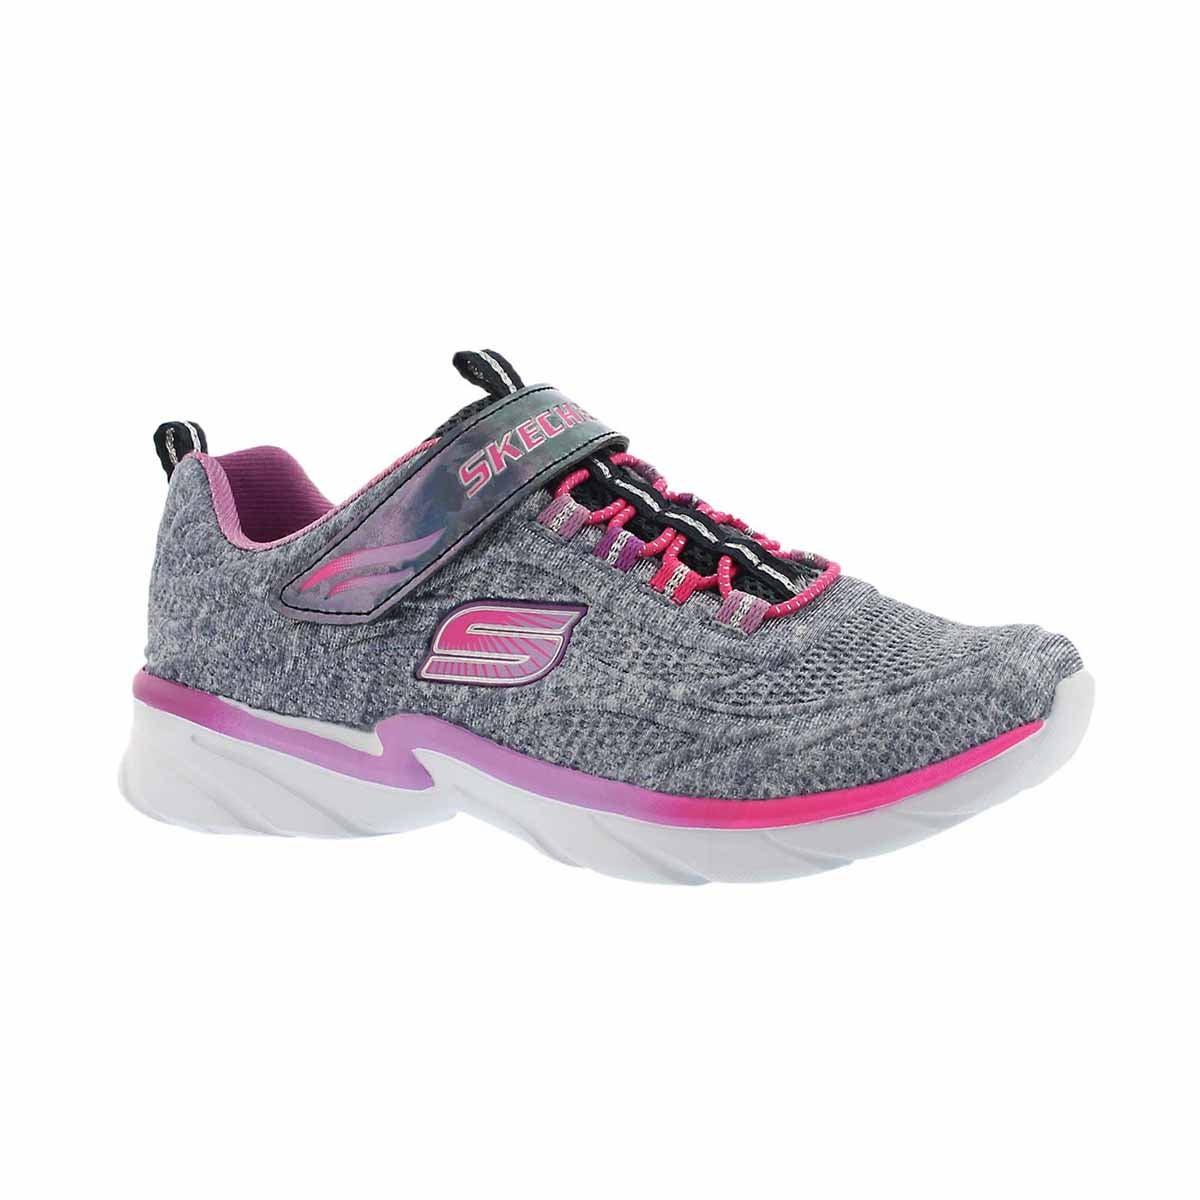 Girls' SWIRLY GIRL navy/pink sneakers